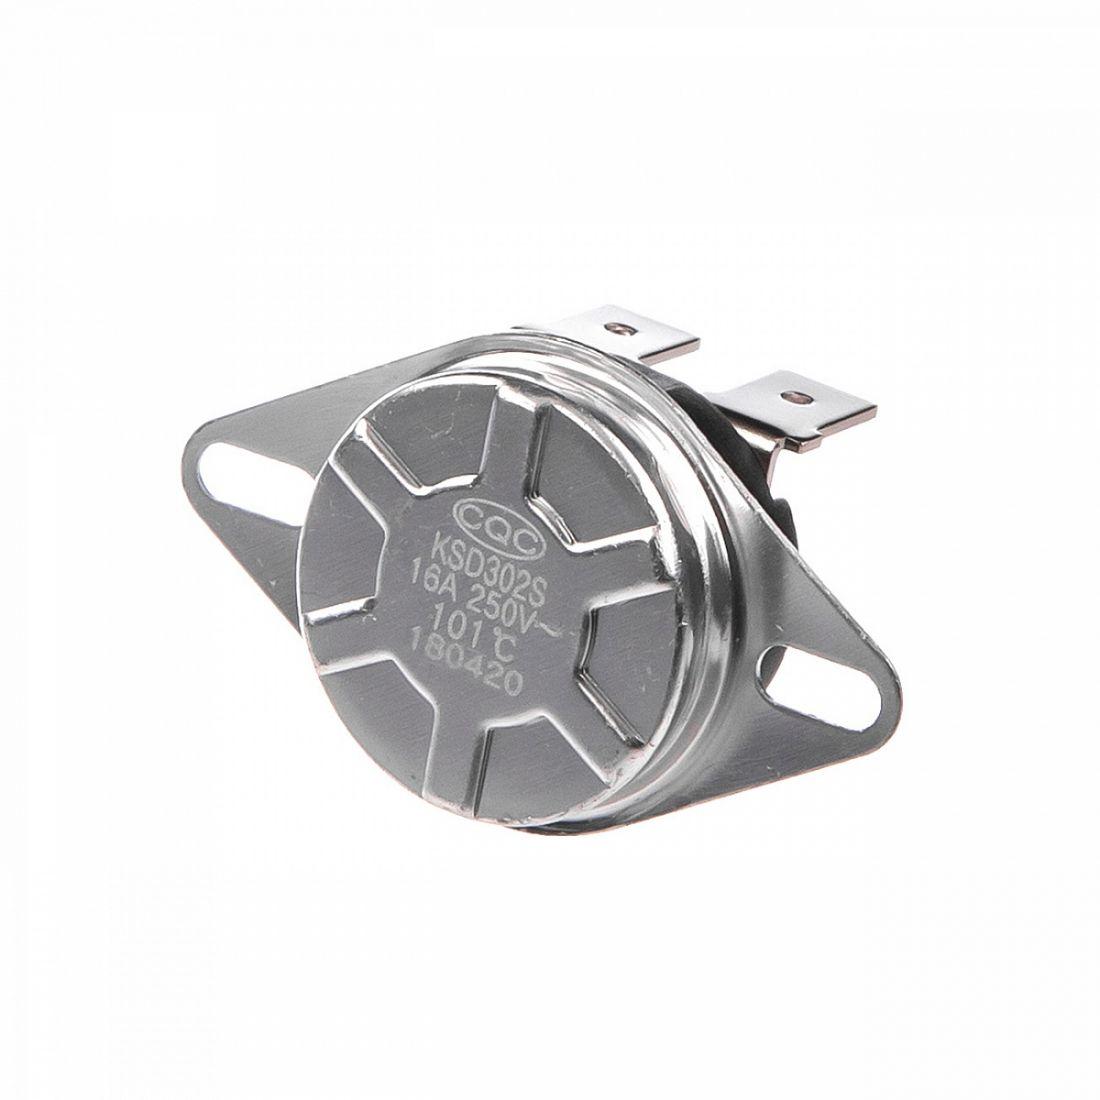 Термопредохранитель KSD 250V 16A 101С, (23) GIFT15